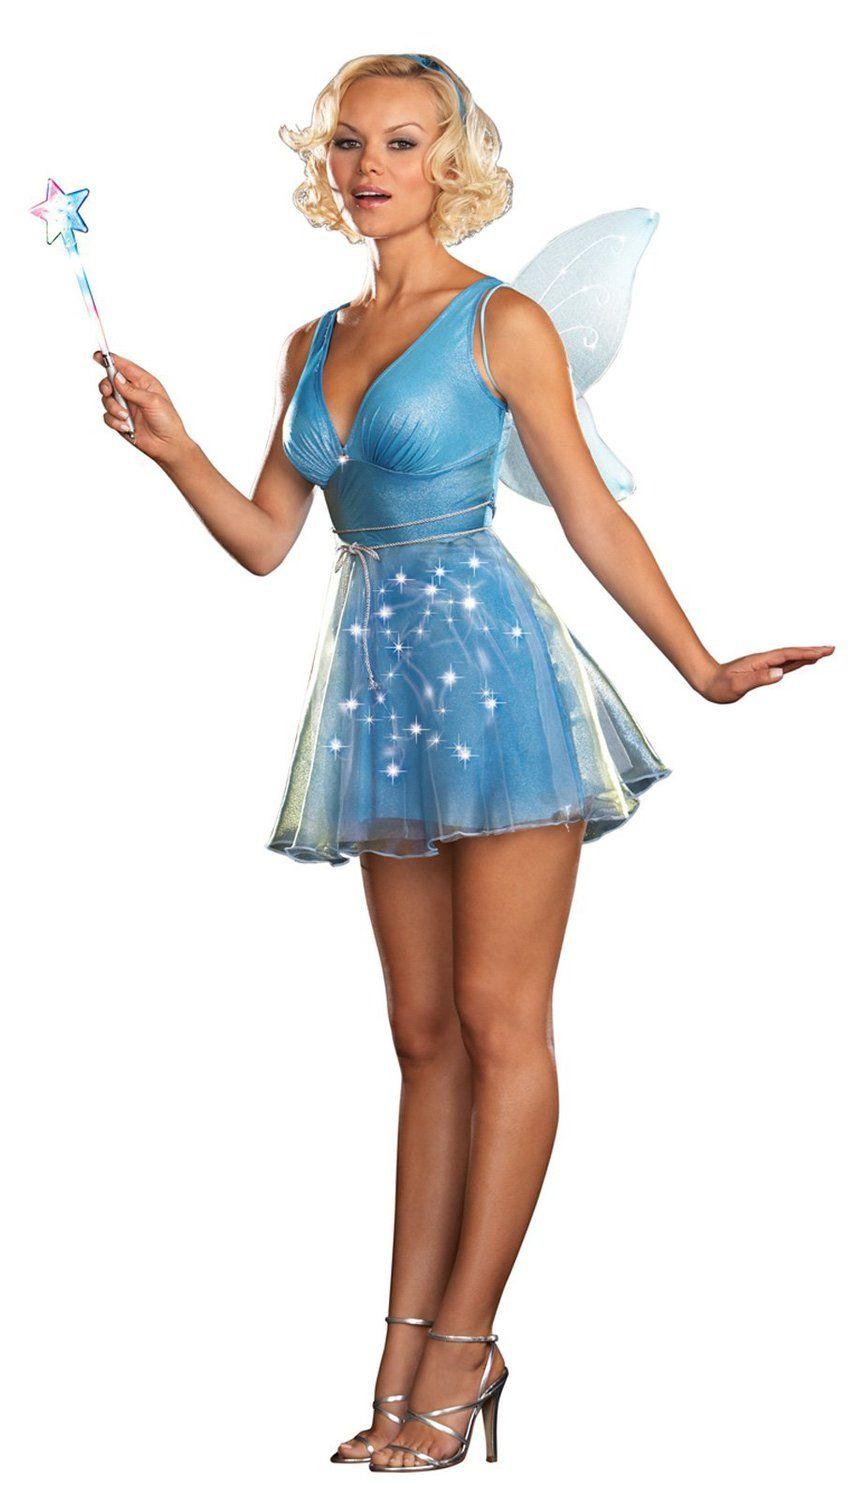 The dress halloween costume - Halloween Costumes